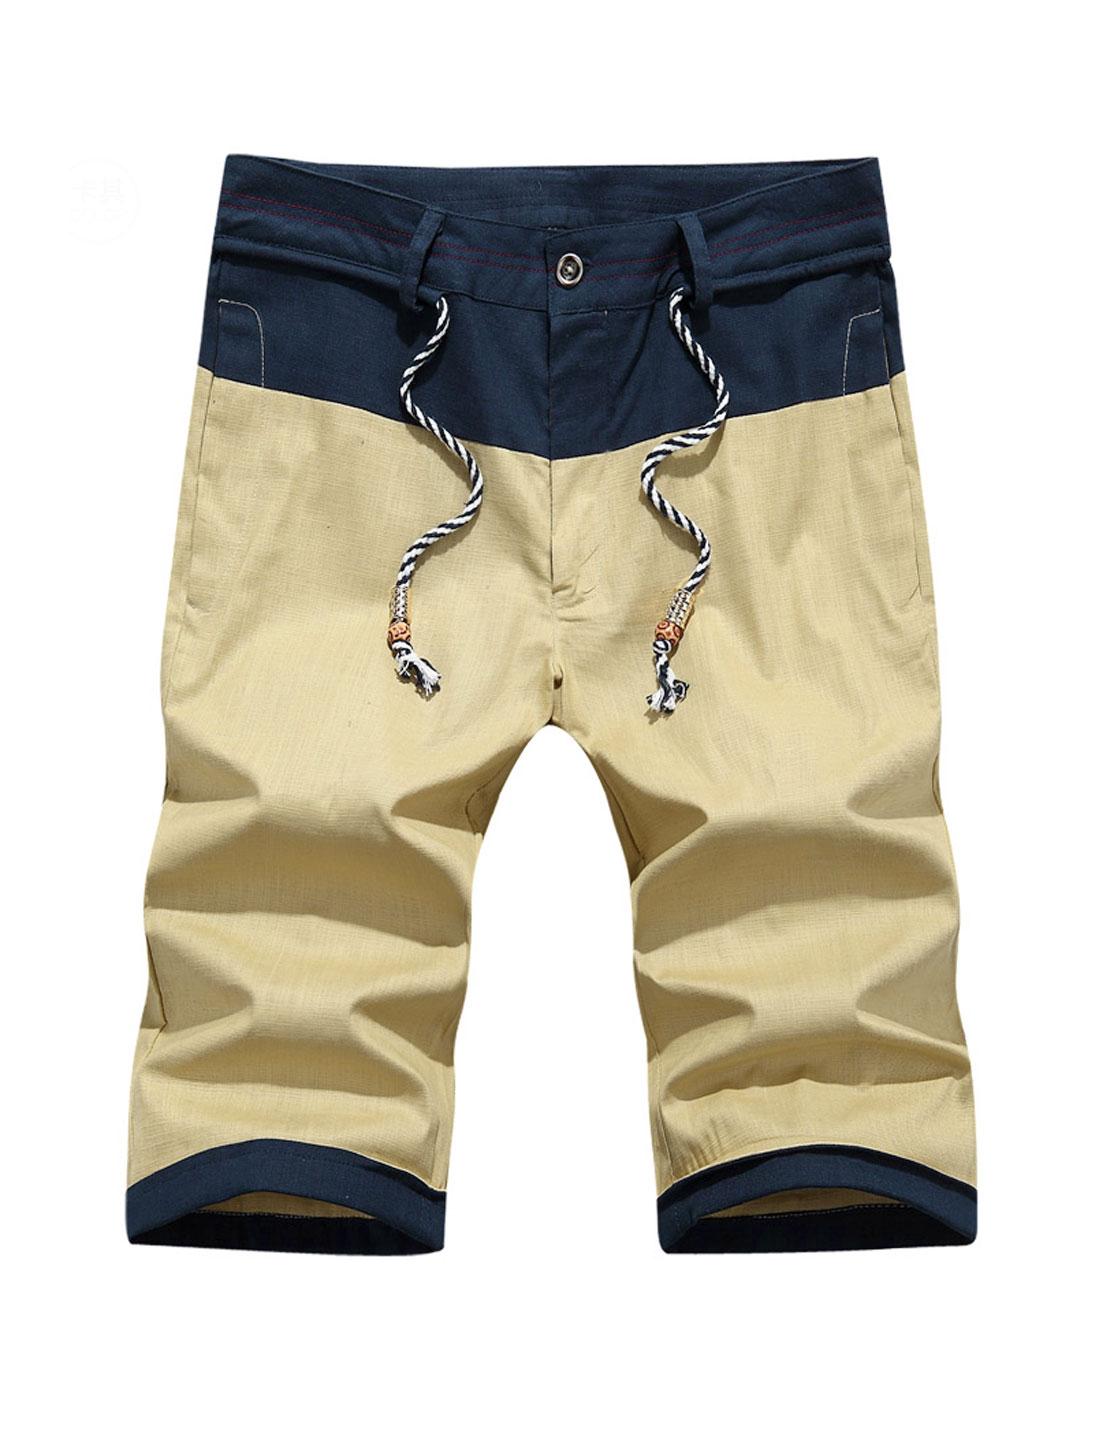 Men Mid Rise Contrast Color Welt Hip Pockets Casual Shorts Khaki W30